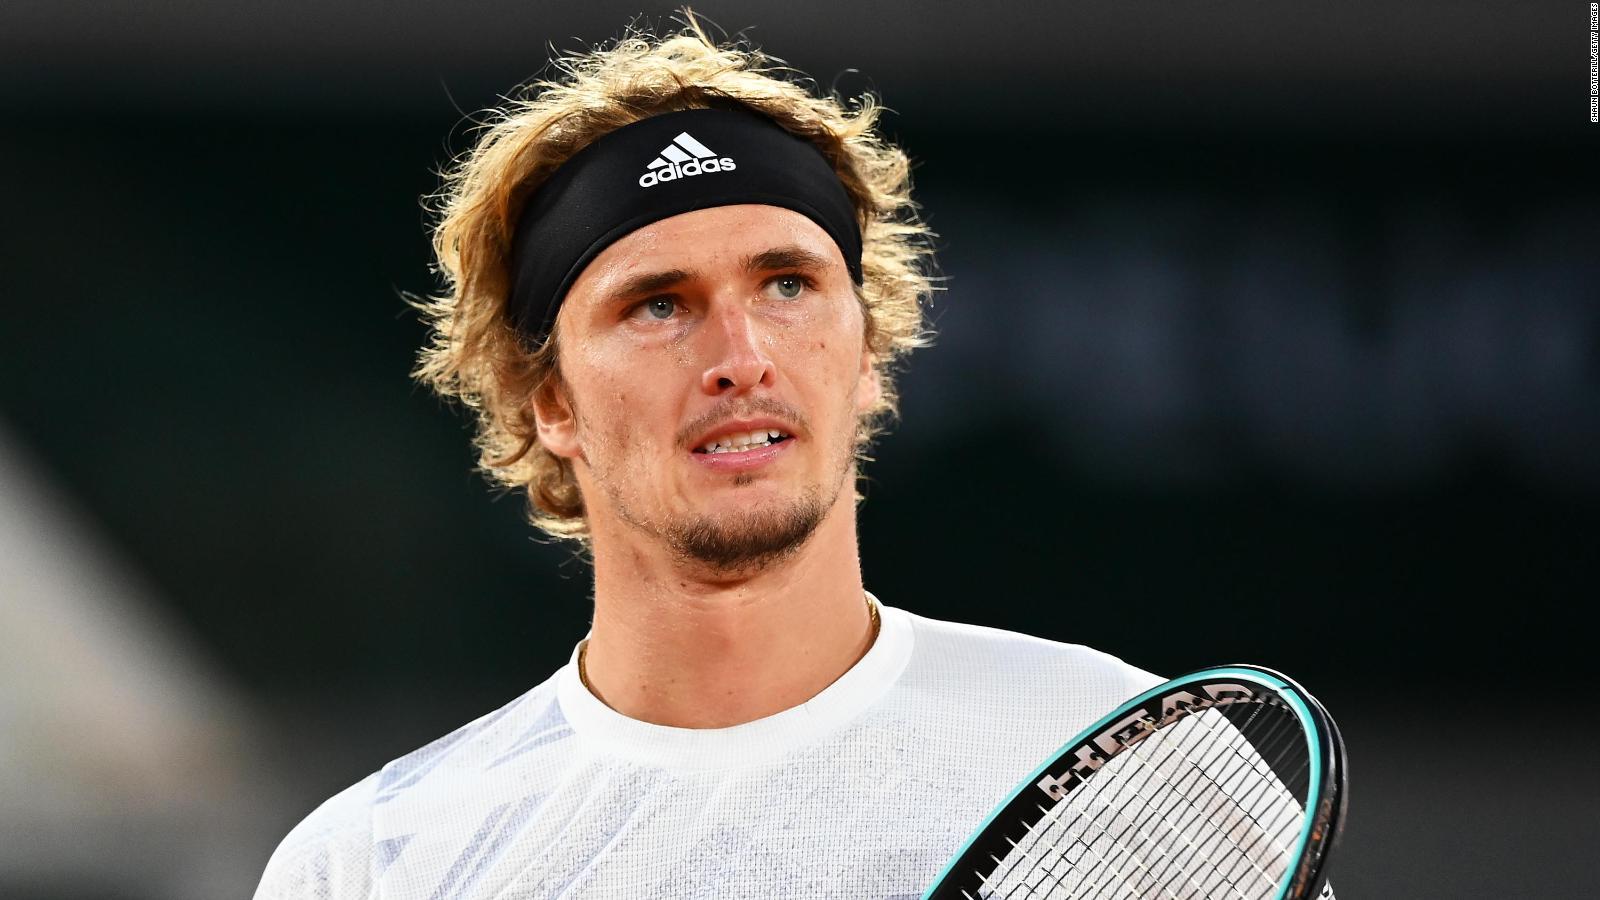 Zverev Wimbledon 2021